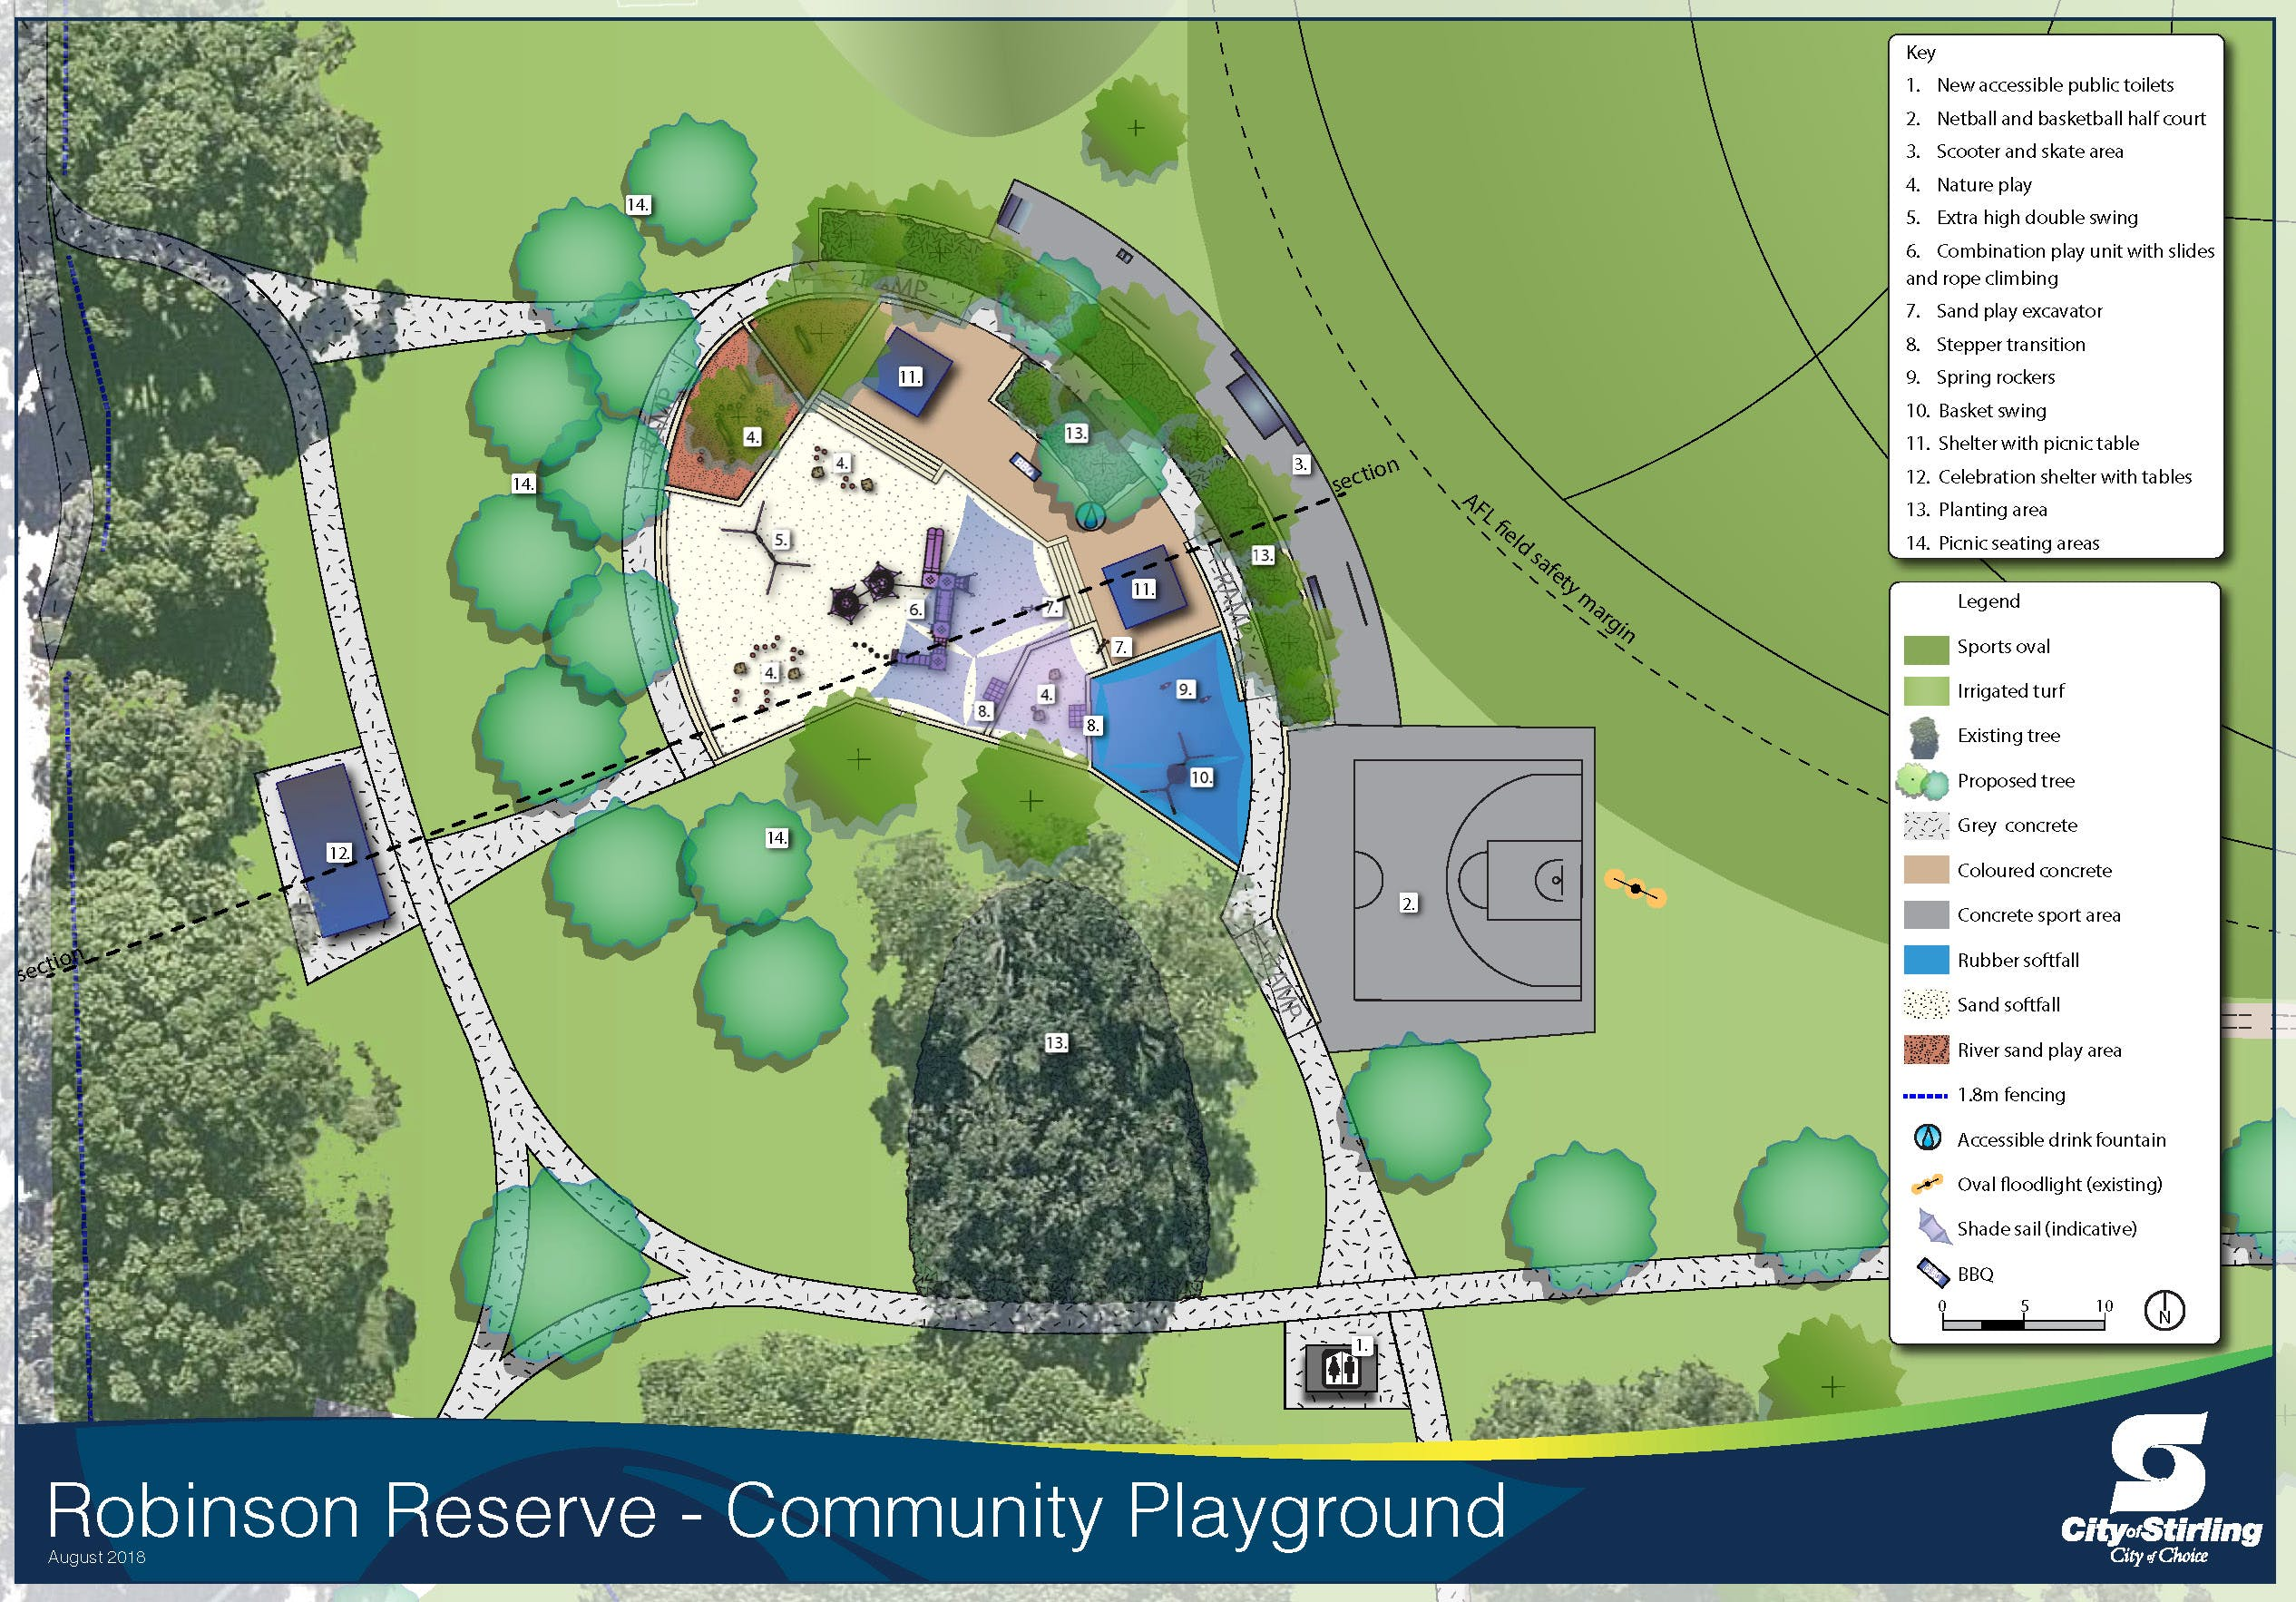 Robinson Reserve Community Playground Concept Design